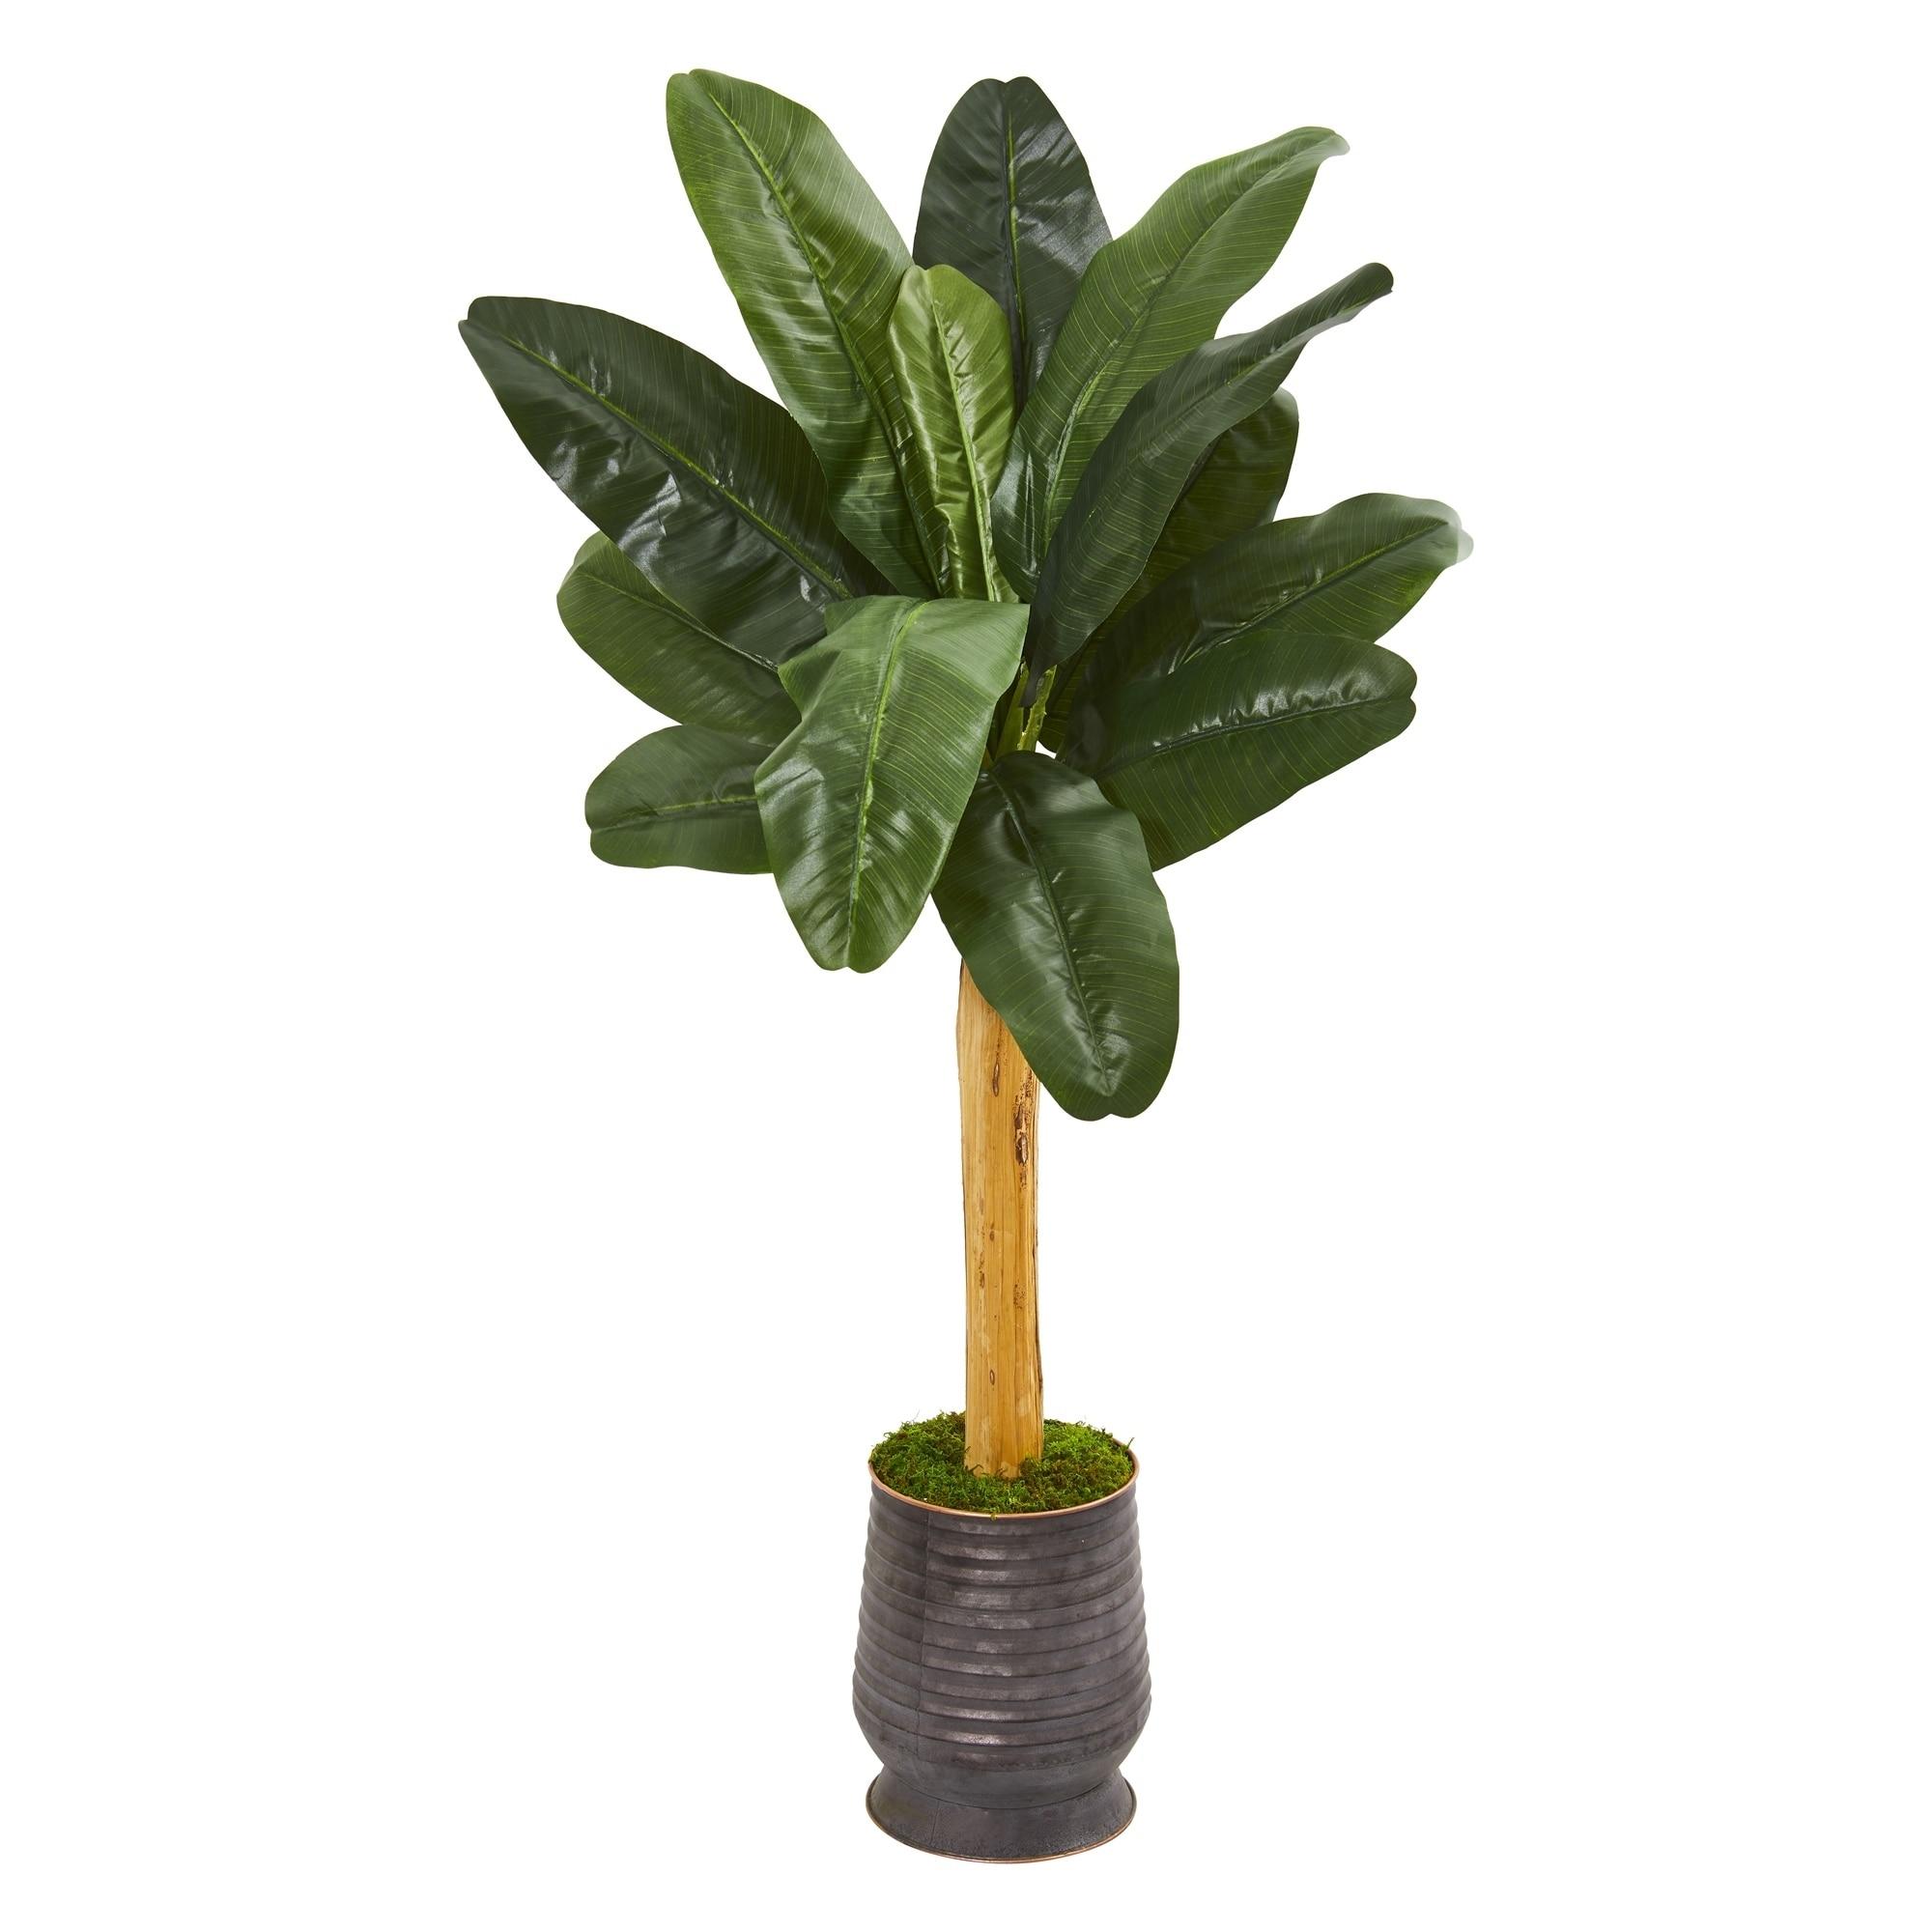 5 Banana Artificial Tree in Ribbed Metal Planter